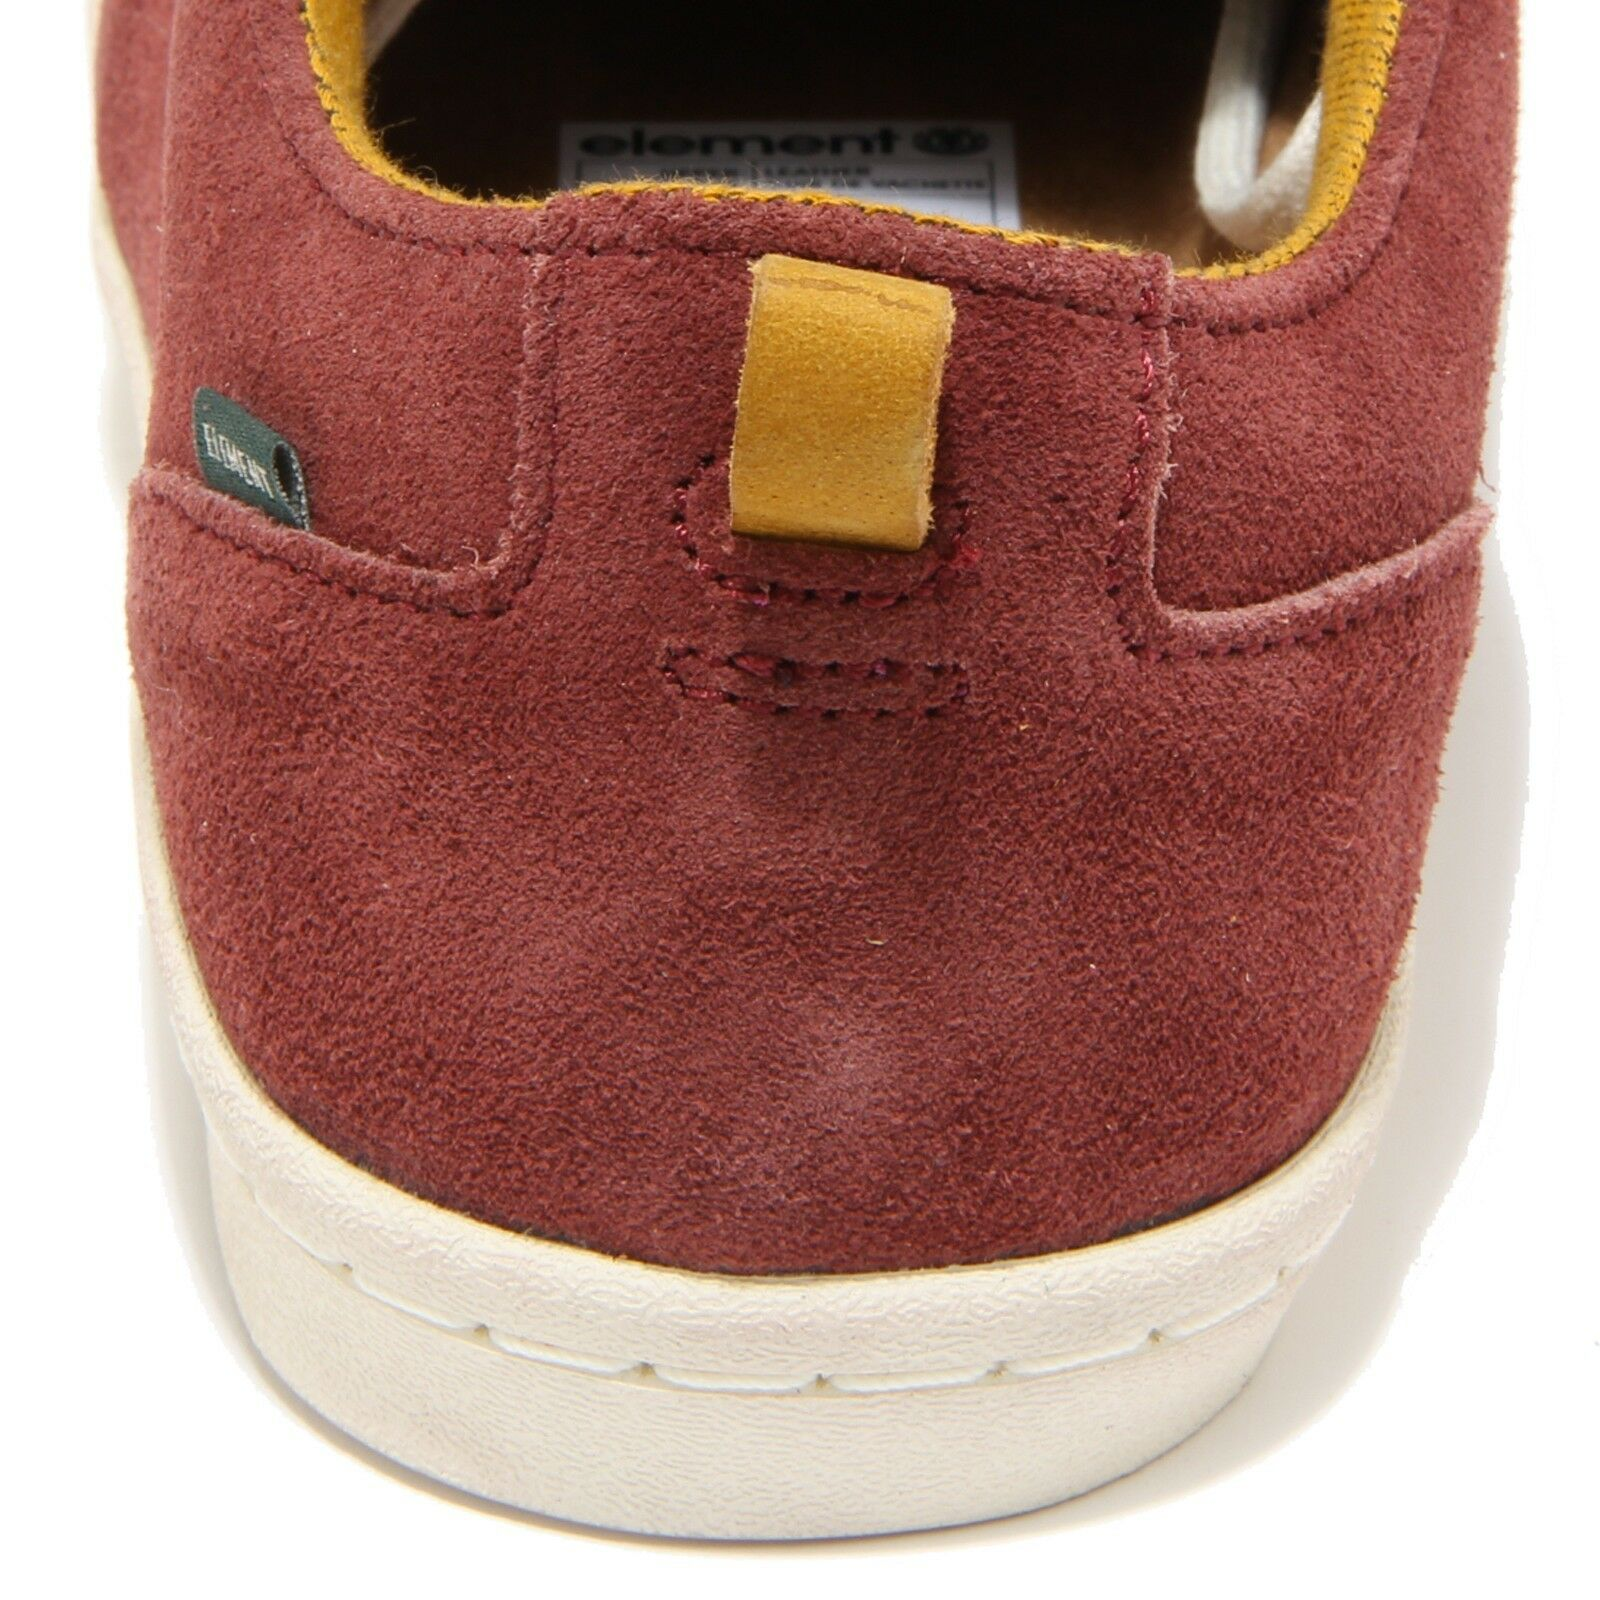 8844I ELEUomoT  emerald catalina emerald   scarpe uomo scarpe da ginnastica shoes Uomo bordeax 992217